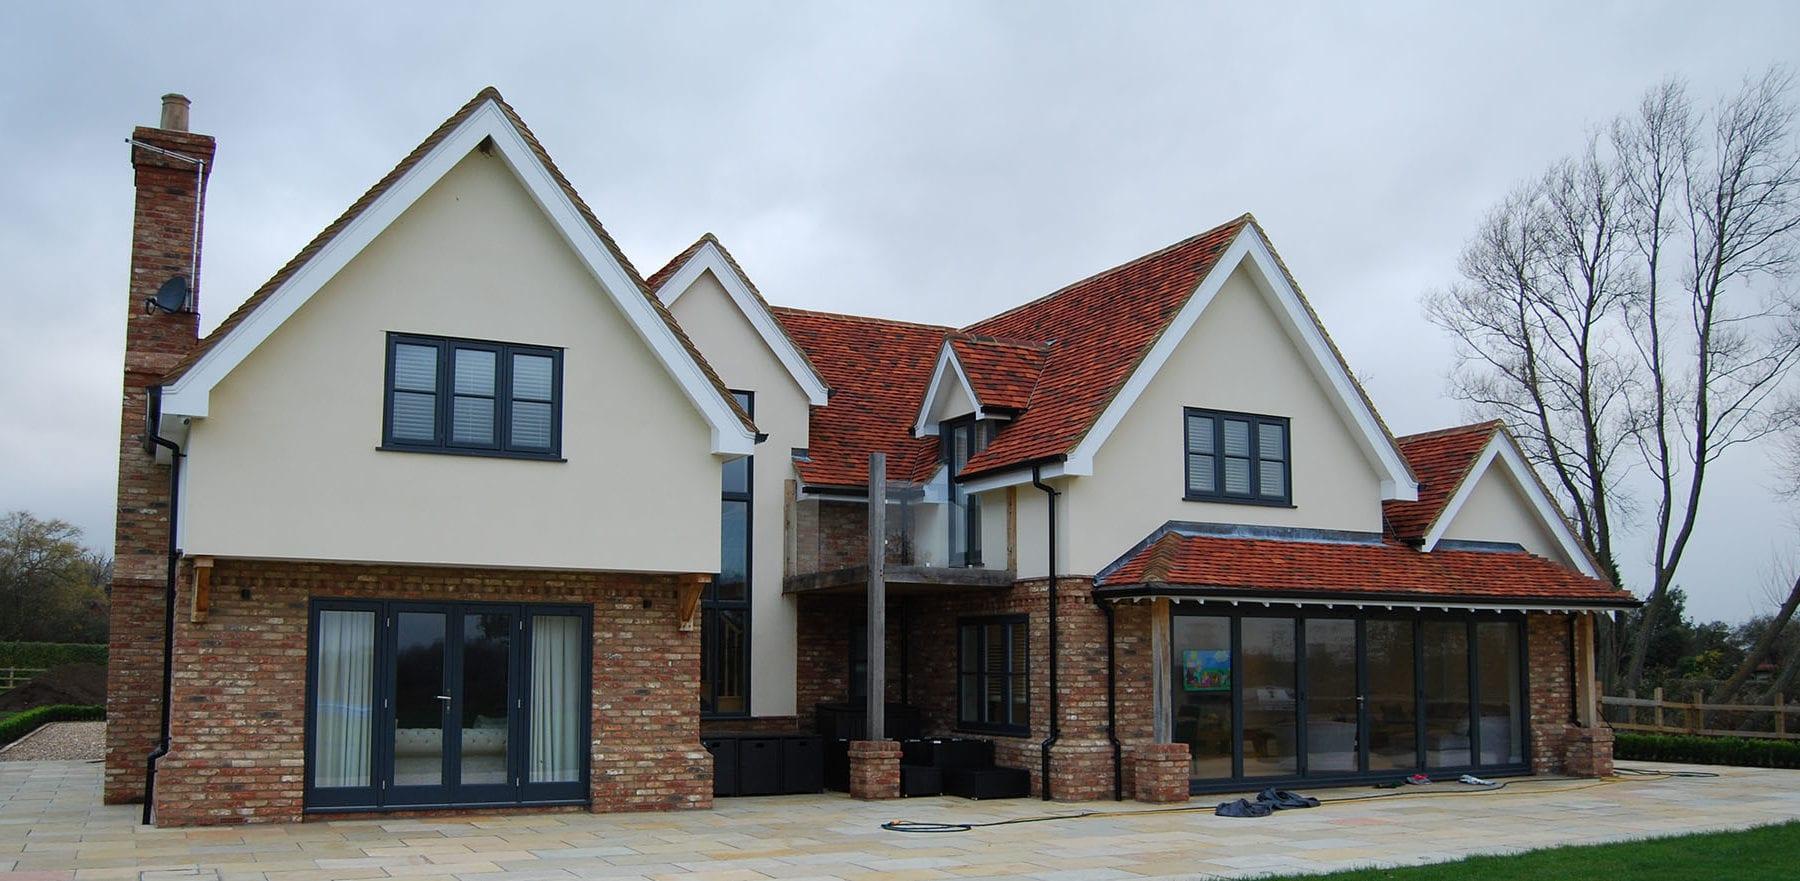 Lifestiles - Handmade Multi Clay Roof Tiles - Nazing, England 5